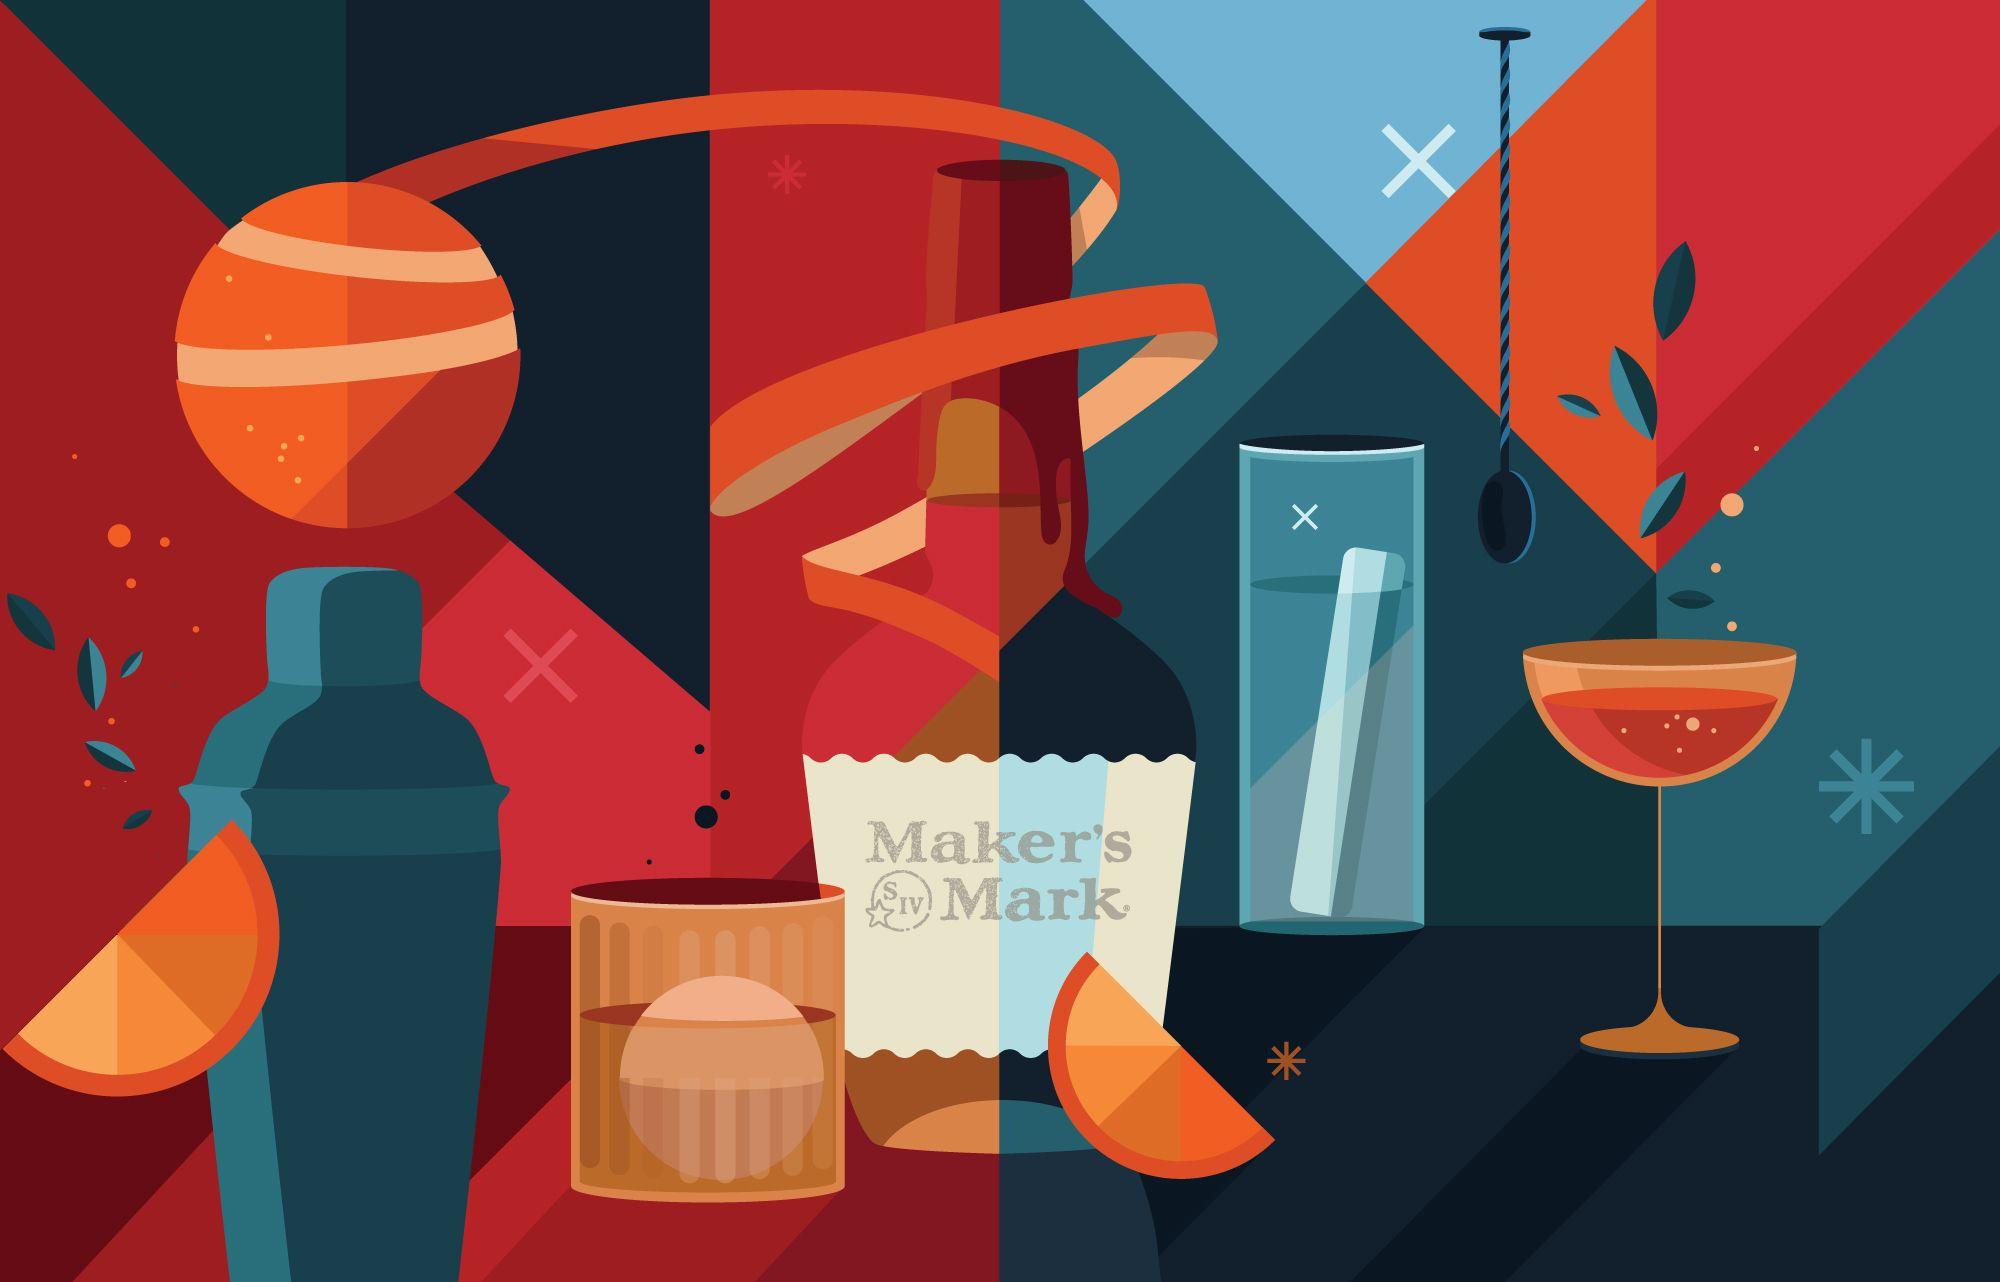 garance-illustration-Irina-Kruglova-MakersMark-poster-5